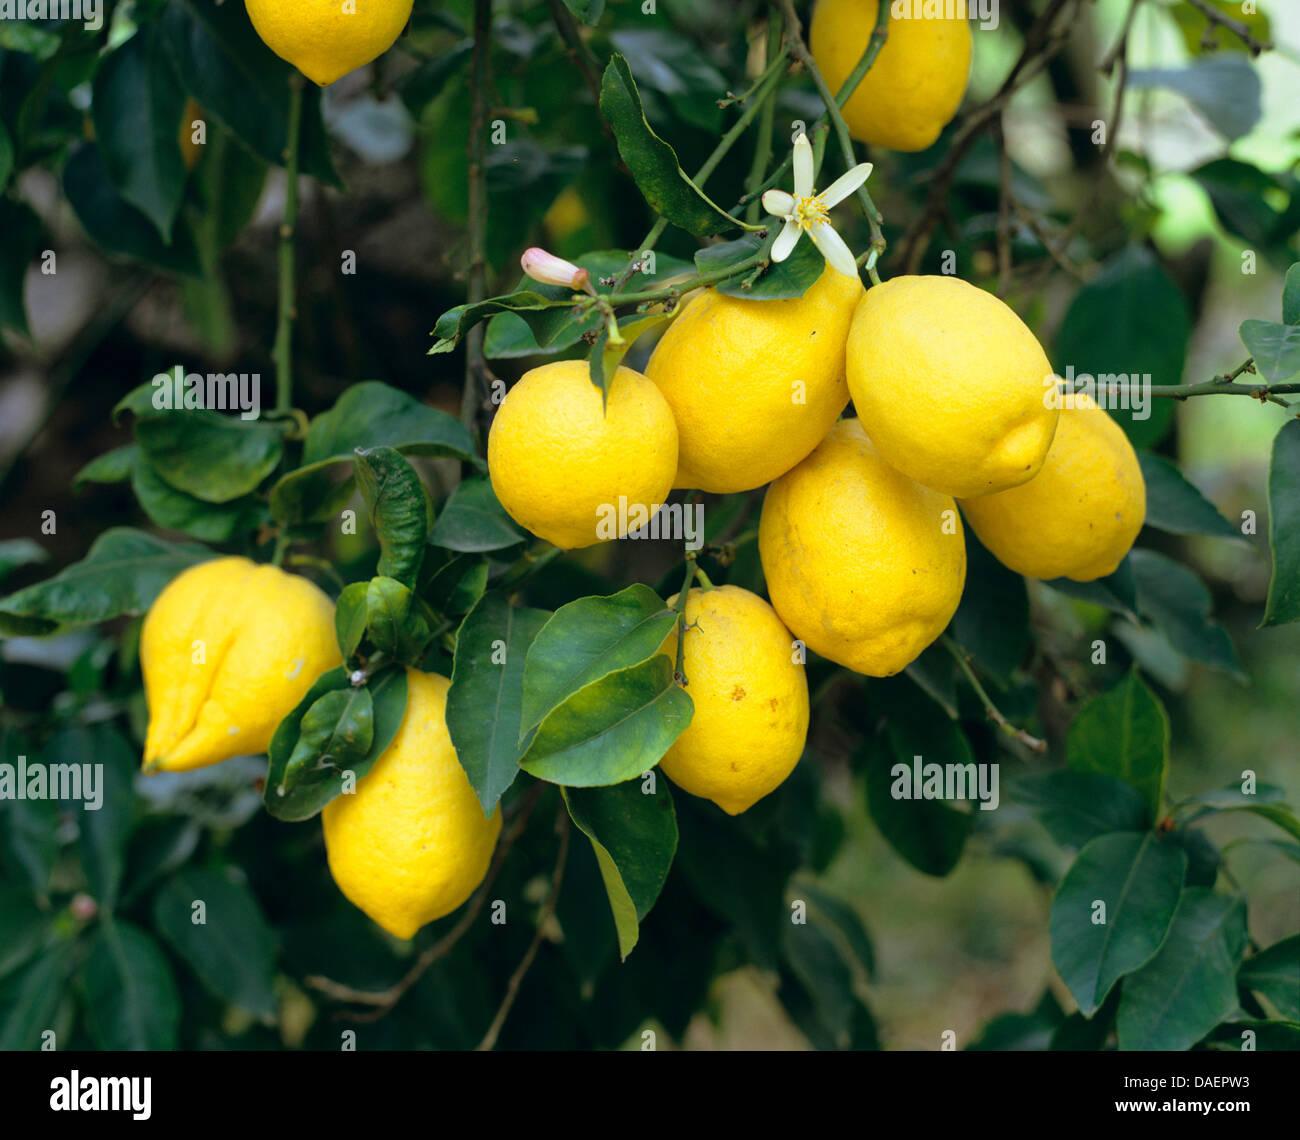 lemon citrus limon lemontree with flowers and ripe lemons greece stock photo 58102943 alamy. Black Bedroom Furniture Sets. Home Design Ideas